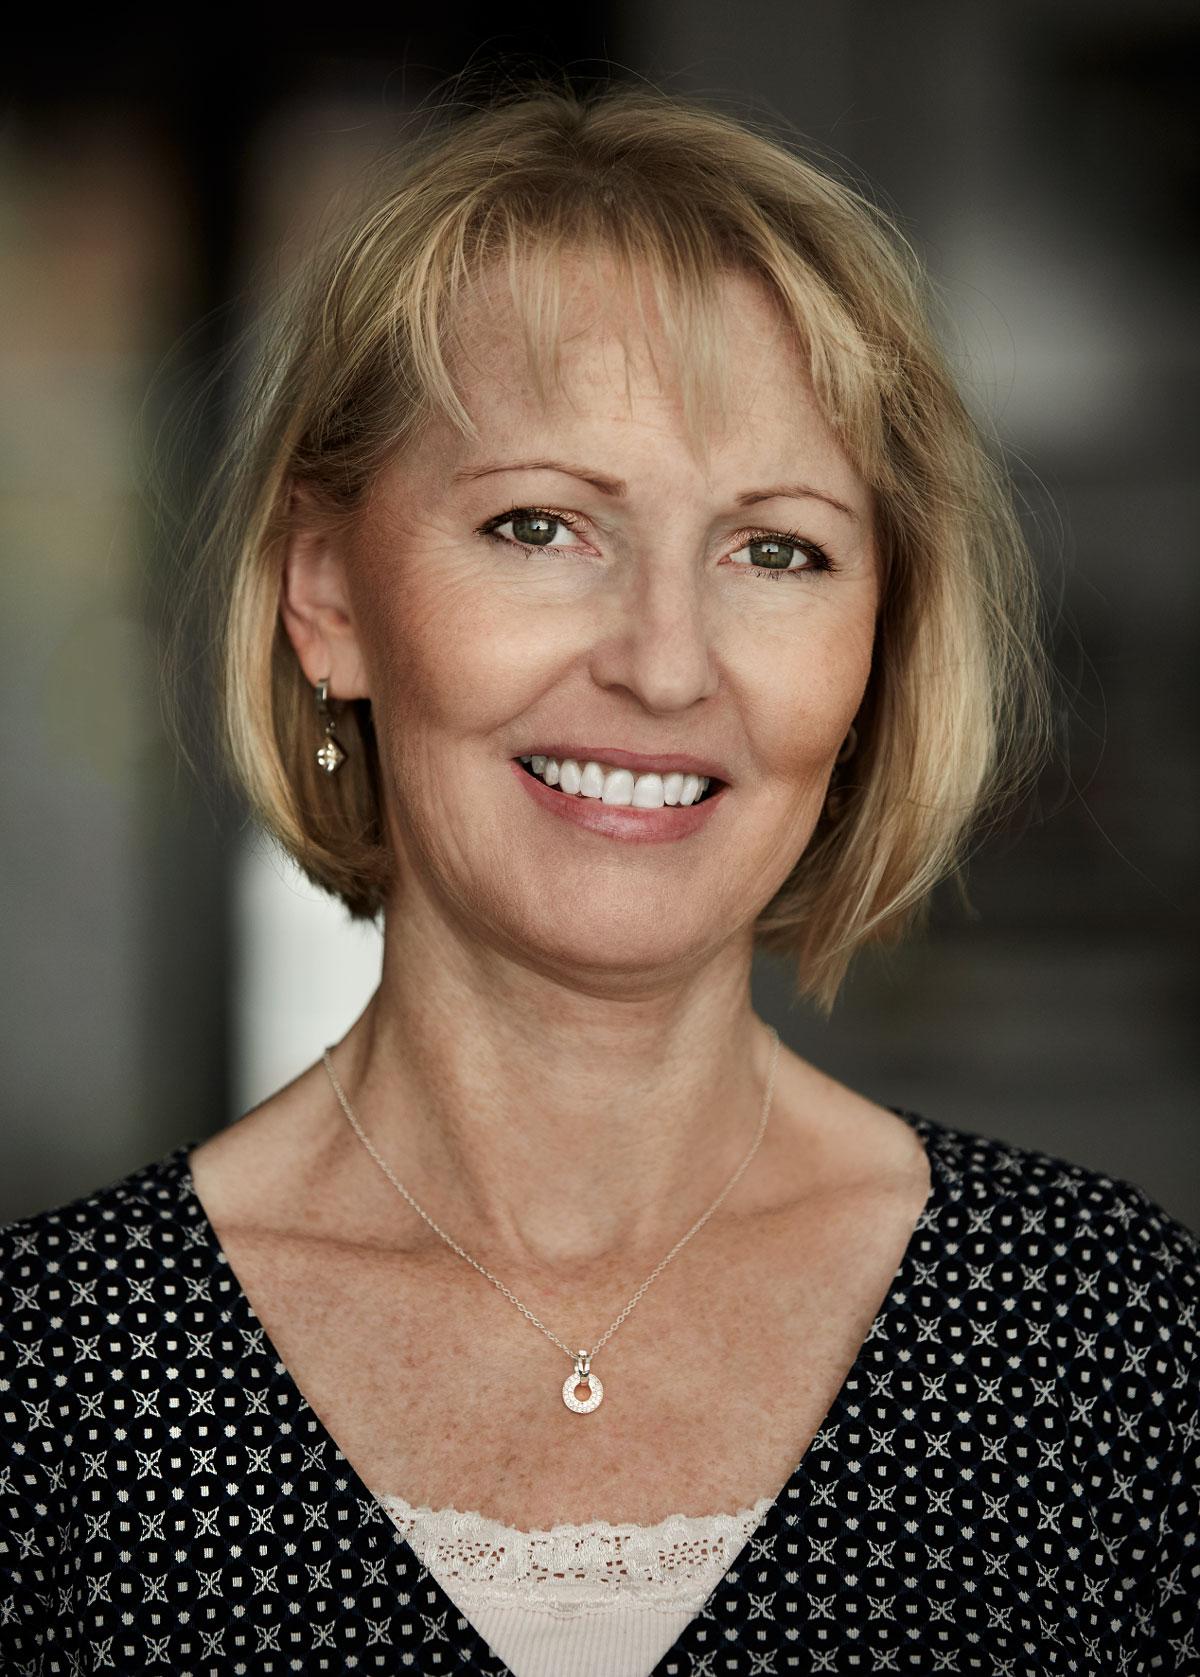 Louise edlund